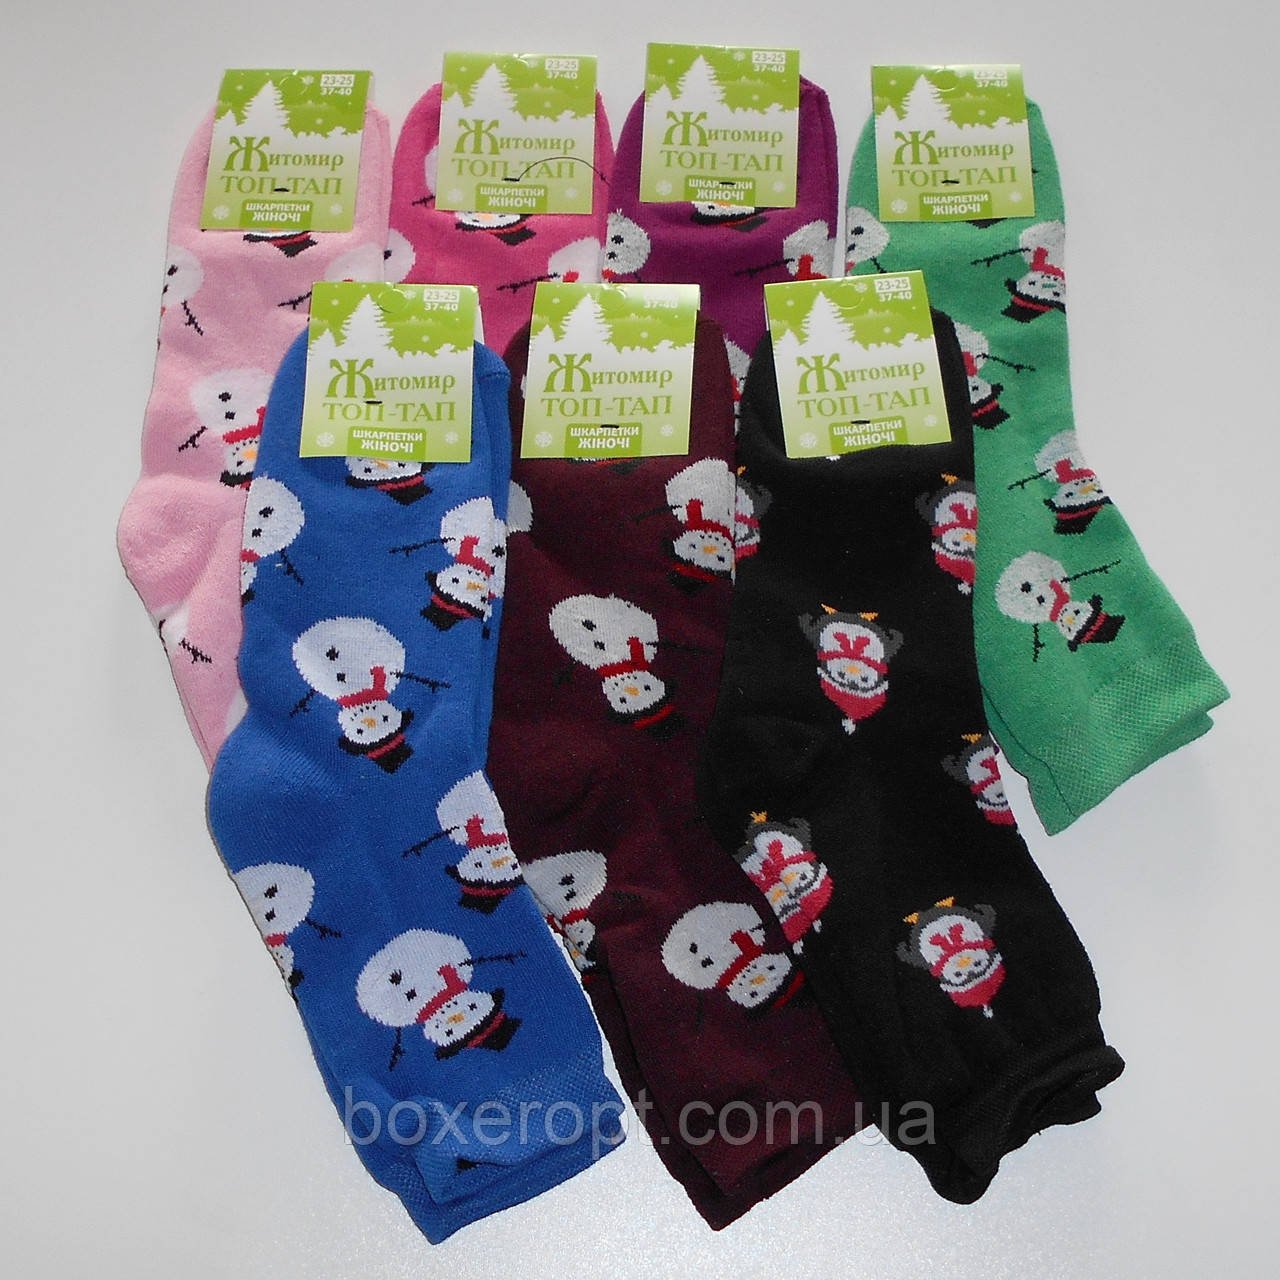 Женские махровые носки Топ-Тап - 11.50 грн./пара (снеговики), фото 1